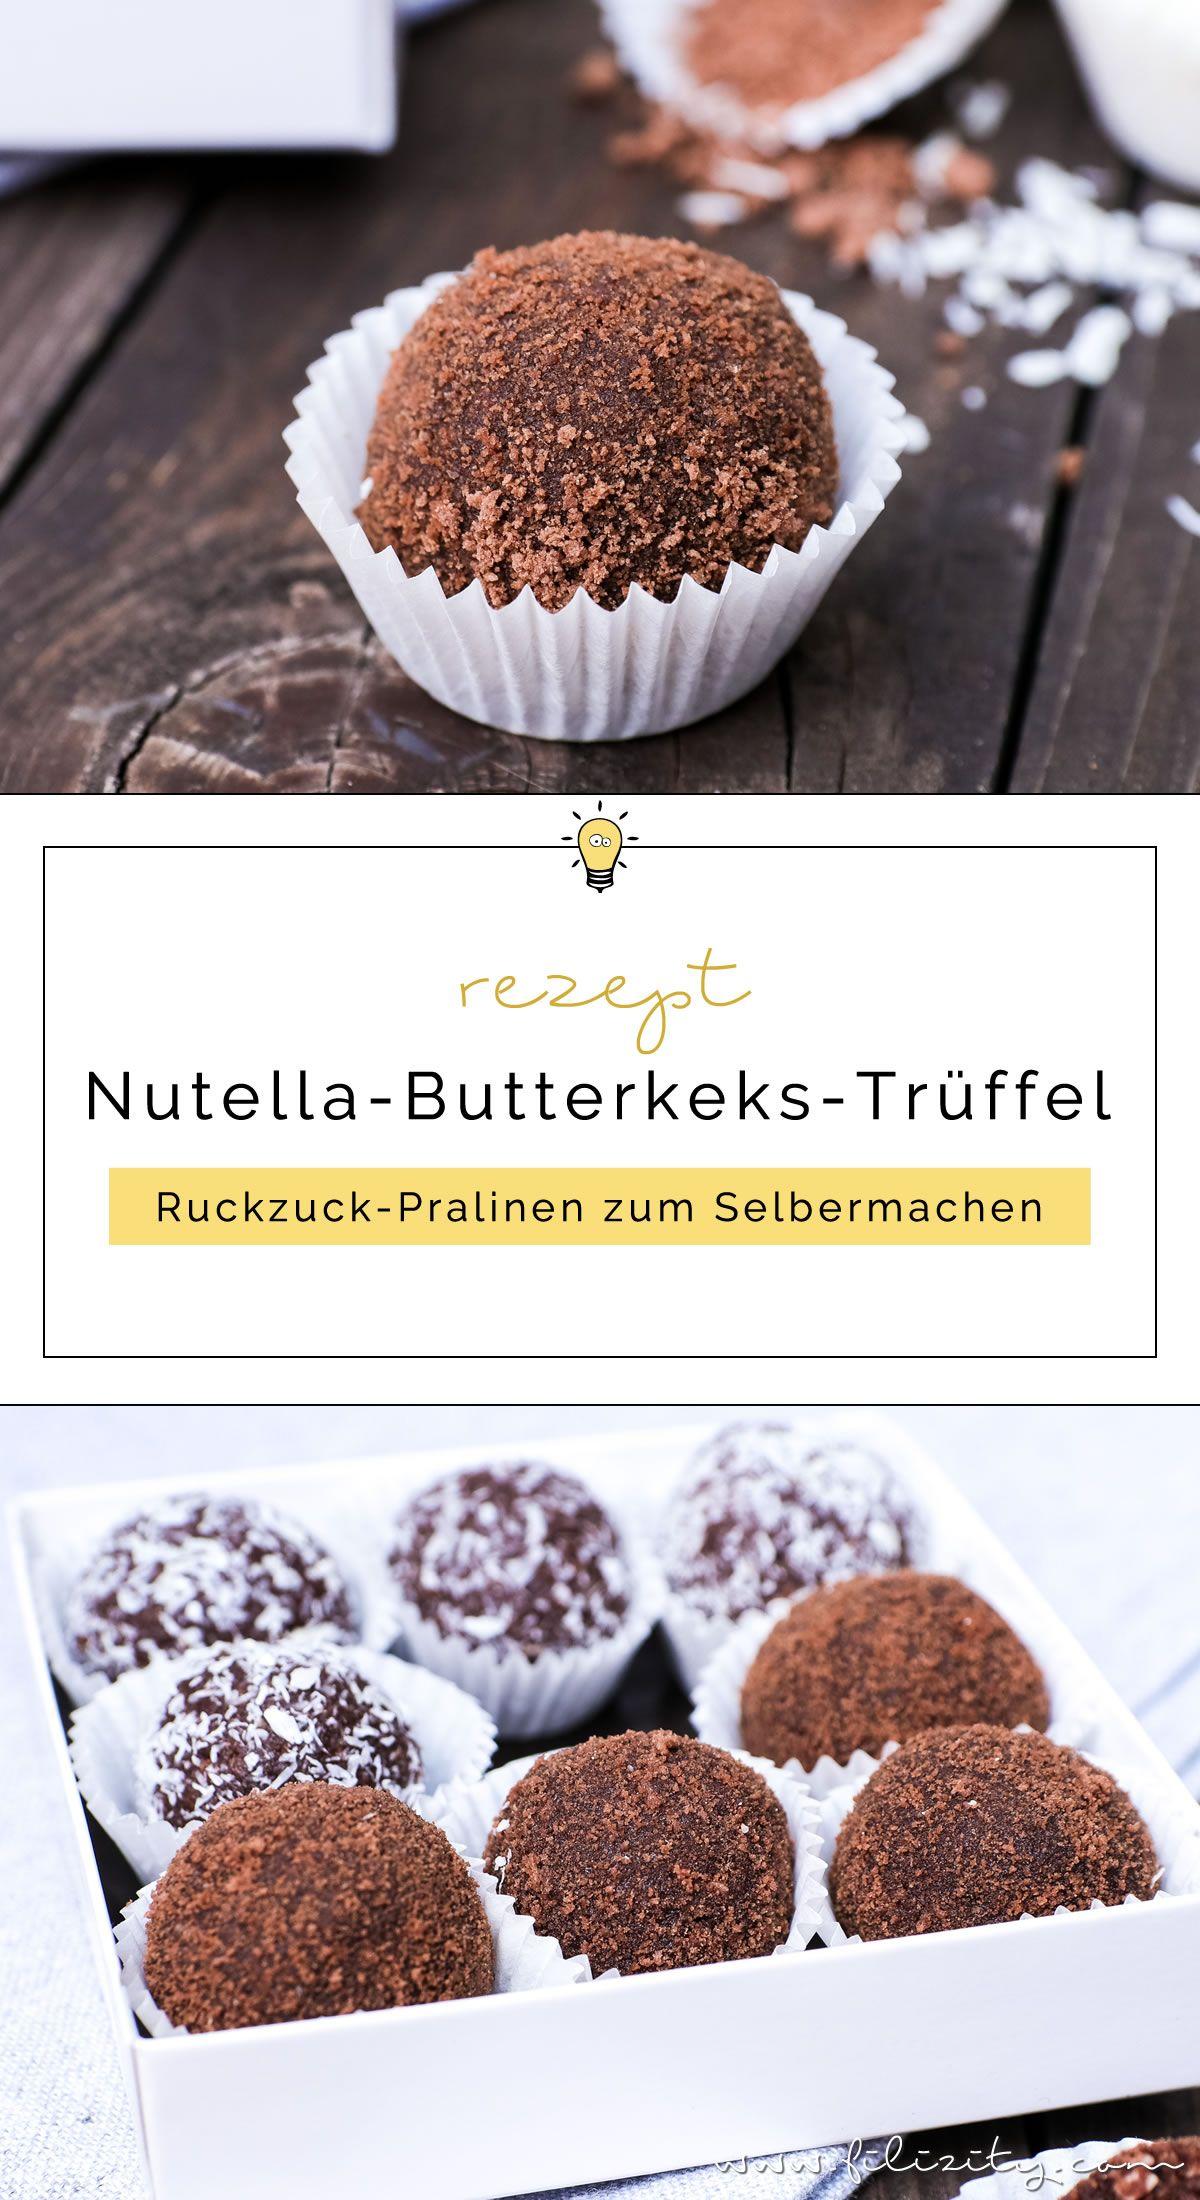 5-Minuten-Pralinen: Nutella-Butterkeks-Trüffel mit Kokos | Filizity.com | Food-Blog aus dem Rheinland